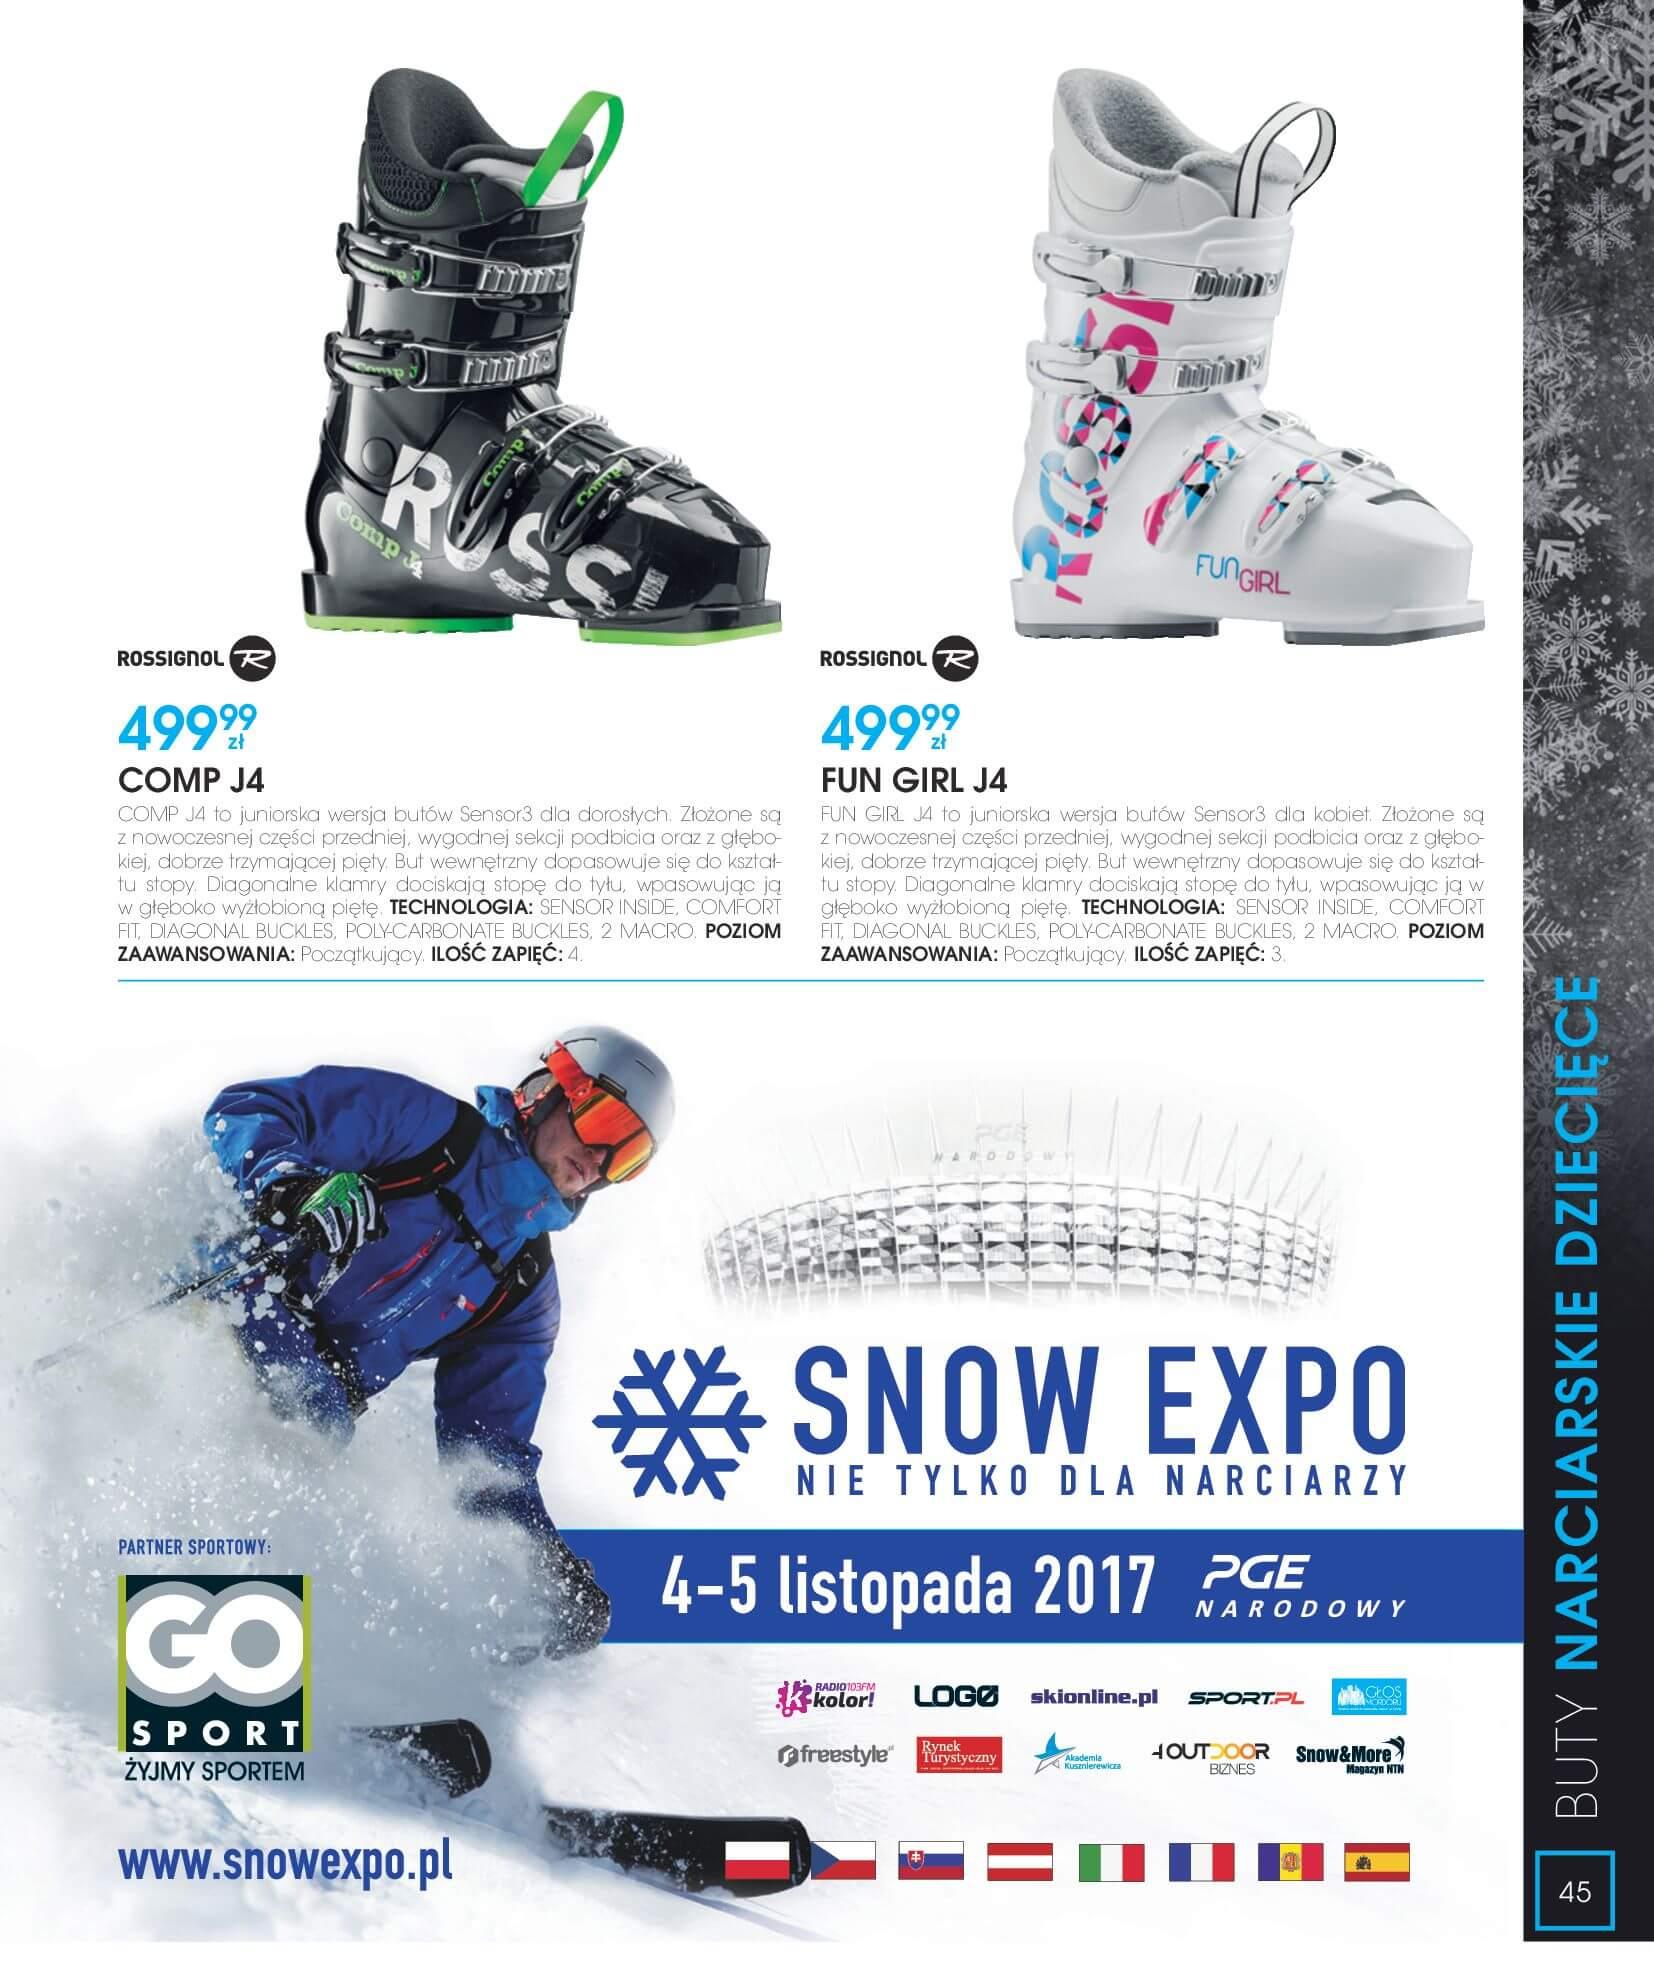 Gazetka Go Sport - Katalog Zima 2017/2018-12.11.2017-28.02.2018-page-45